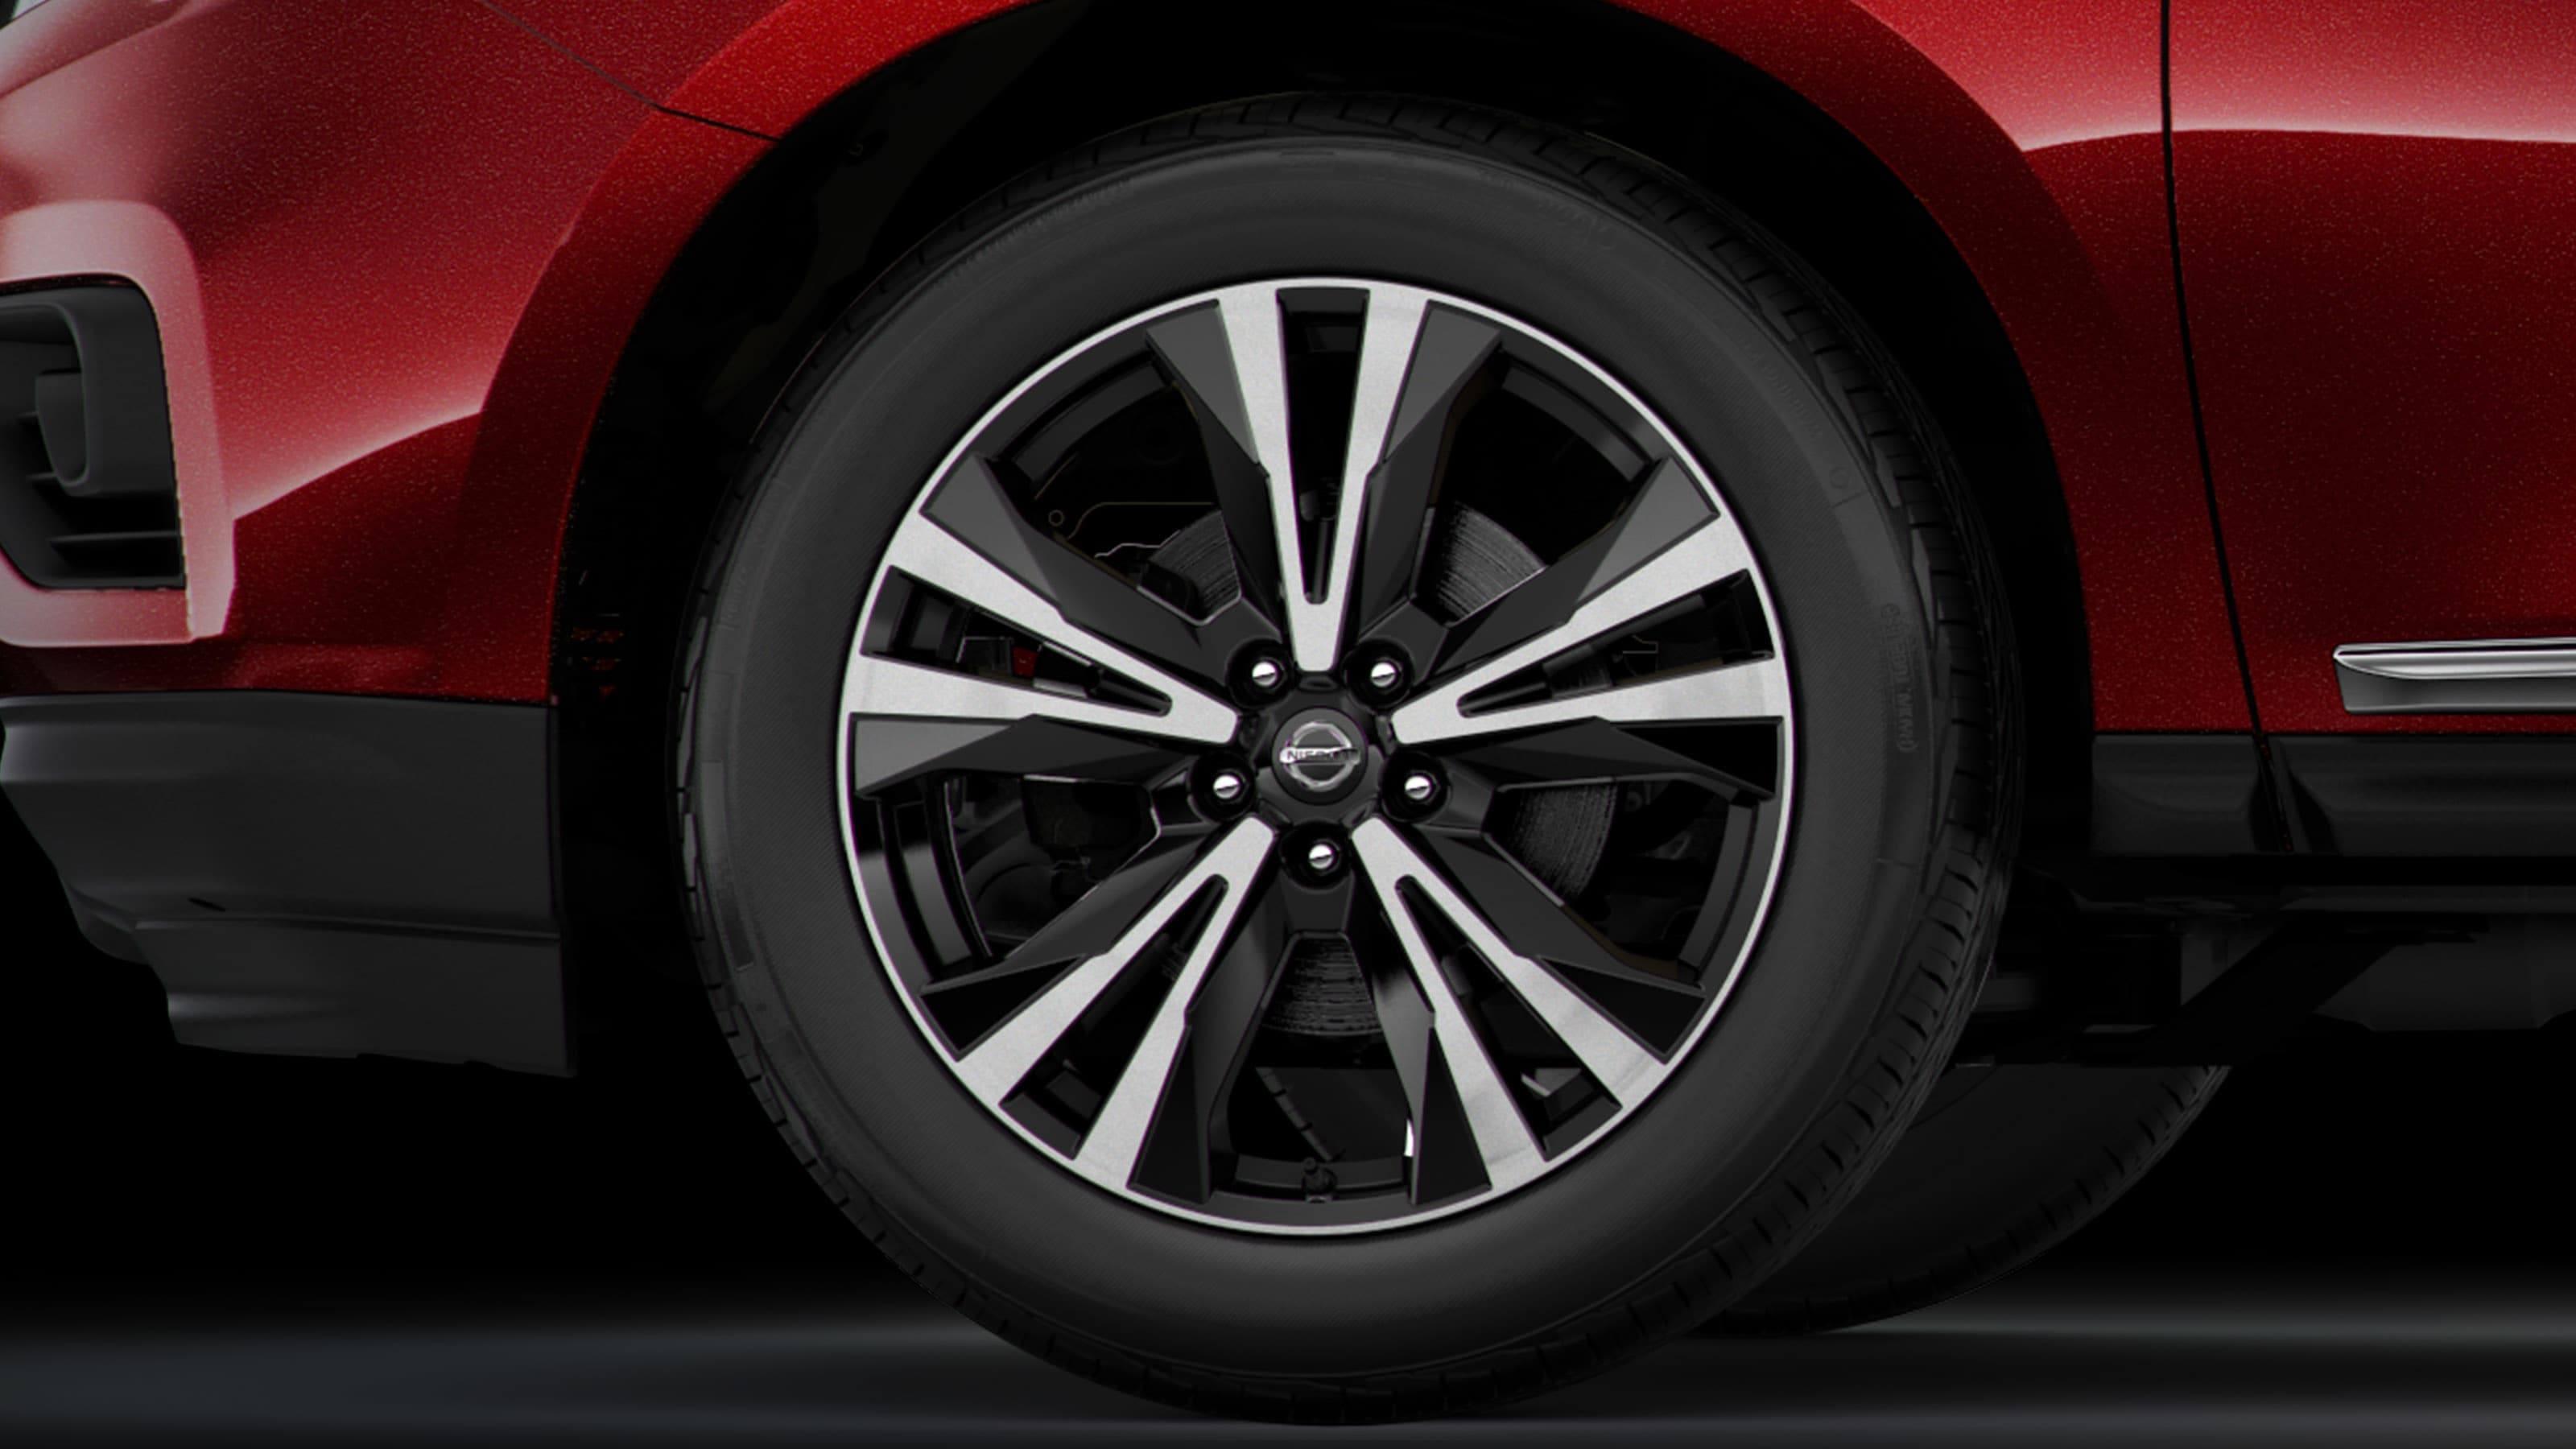 New 2019 Nissan Pathfinder Exterior